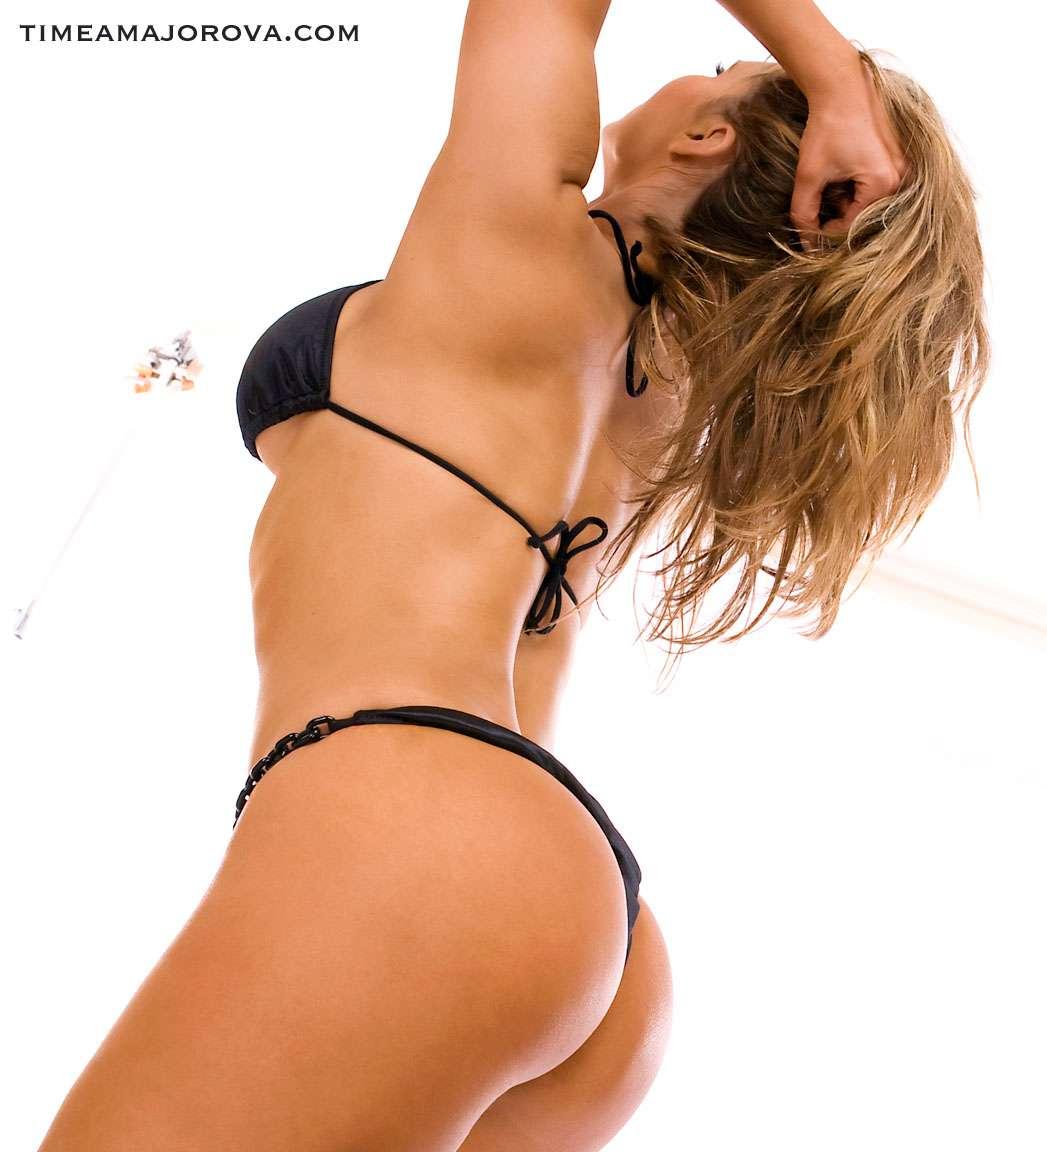 String bikini girls